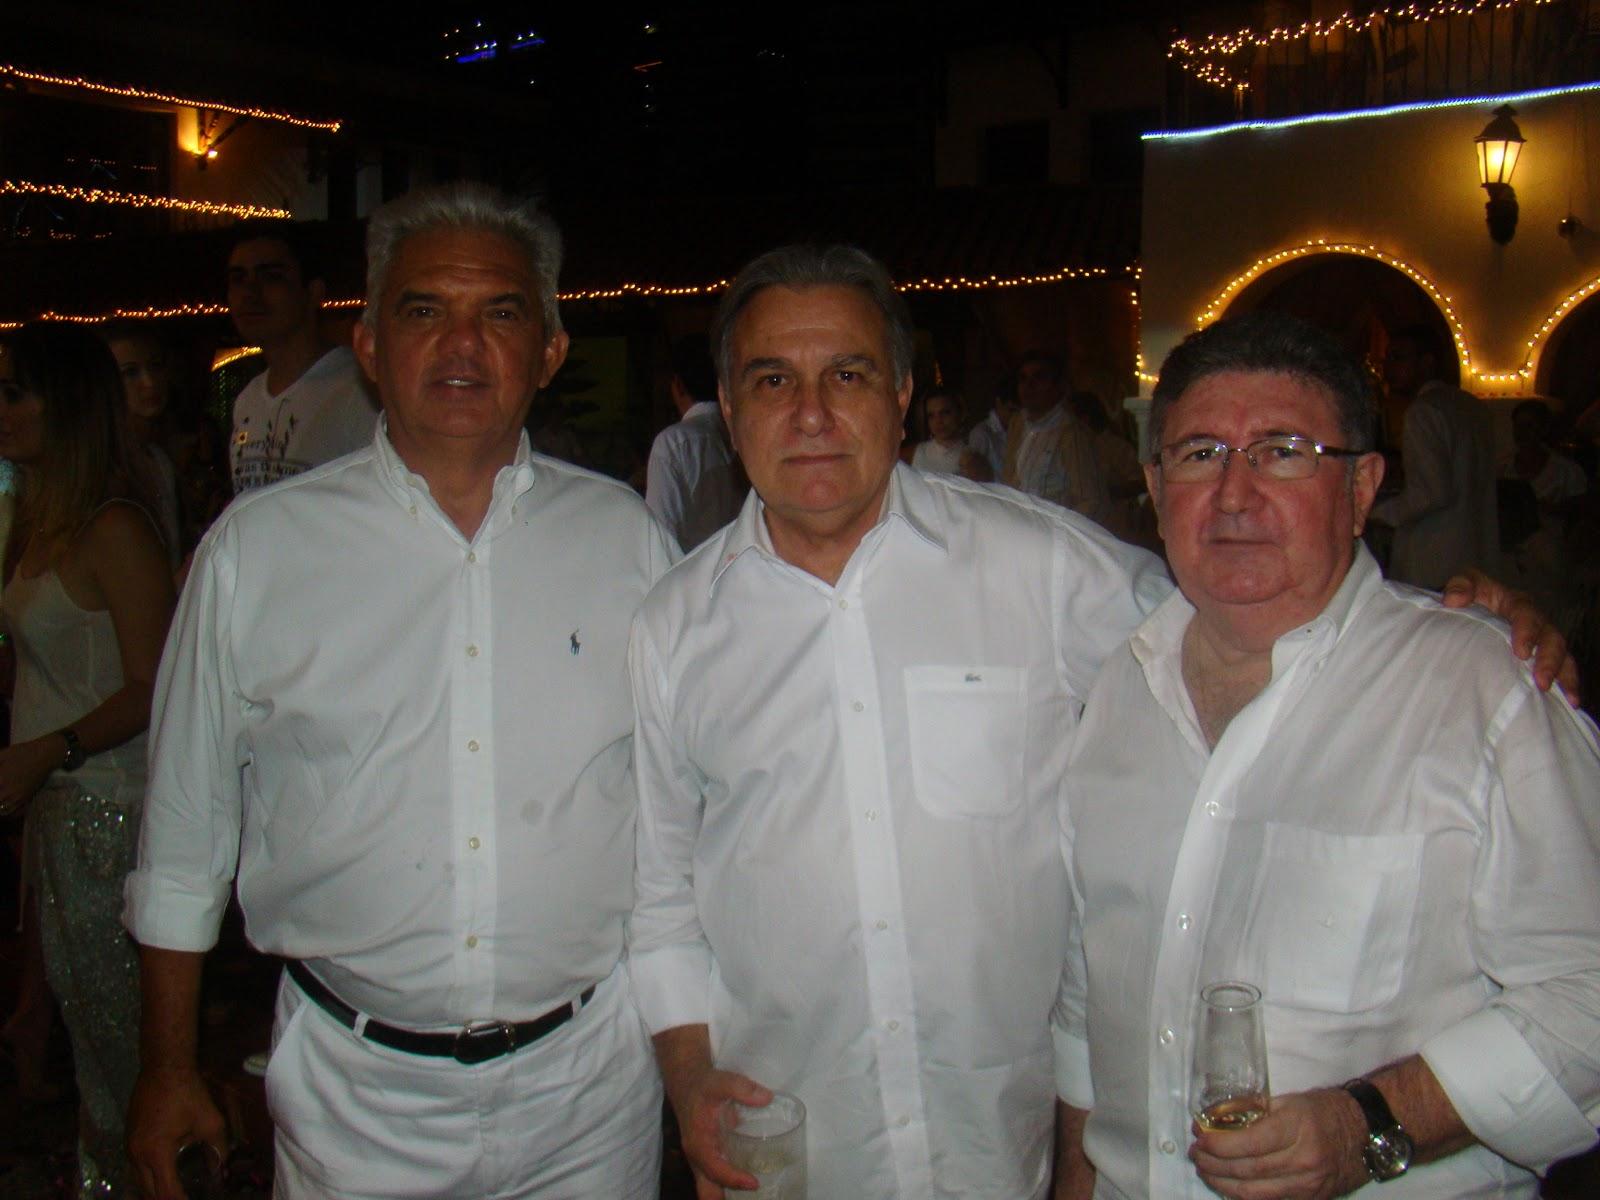 http://3.bp.blogspot.com/-Wt3tQop9cMs/Twi-vQ1-2DI/AAAAAAAAE54/GCCGUcPHcgs/s1600/11+-+Tales+de+S%25C3%25A1+Cavalcante%252C+Armando+Campos+e+Humberto+Cavalcante.JPG